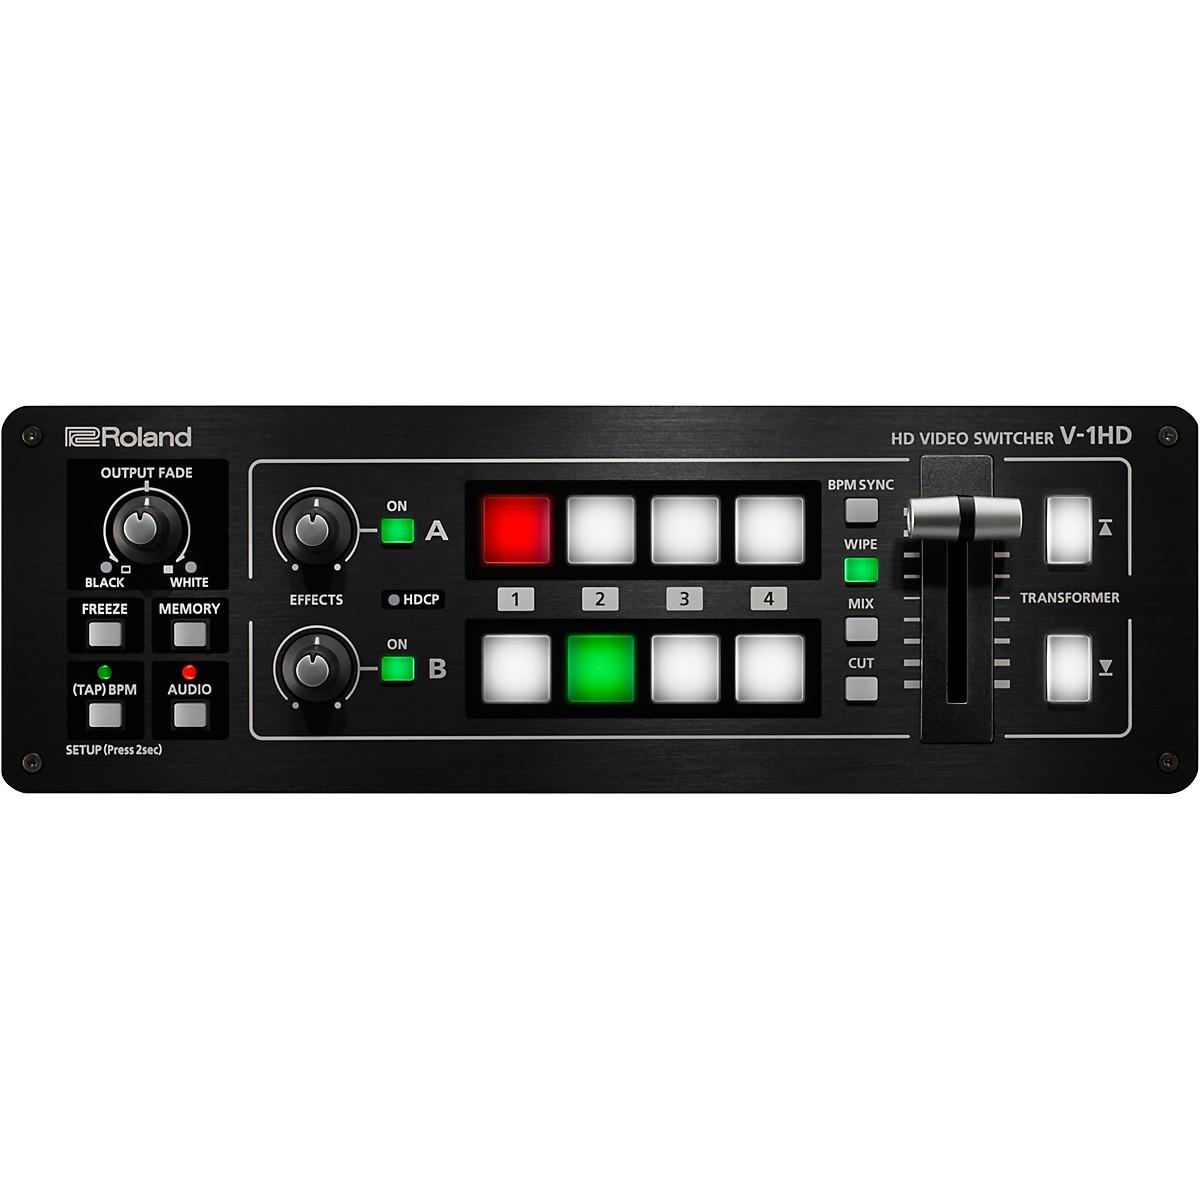 Roland V1-HD HD Video Switcher